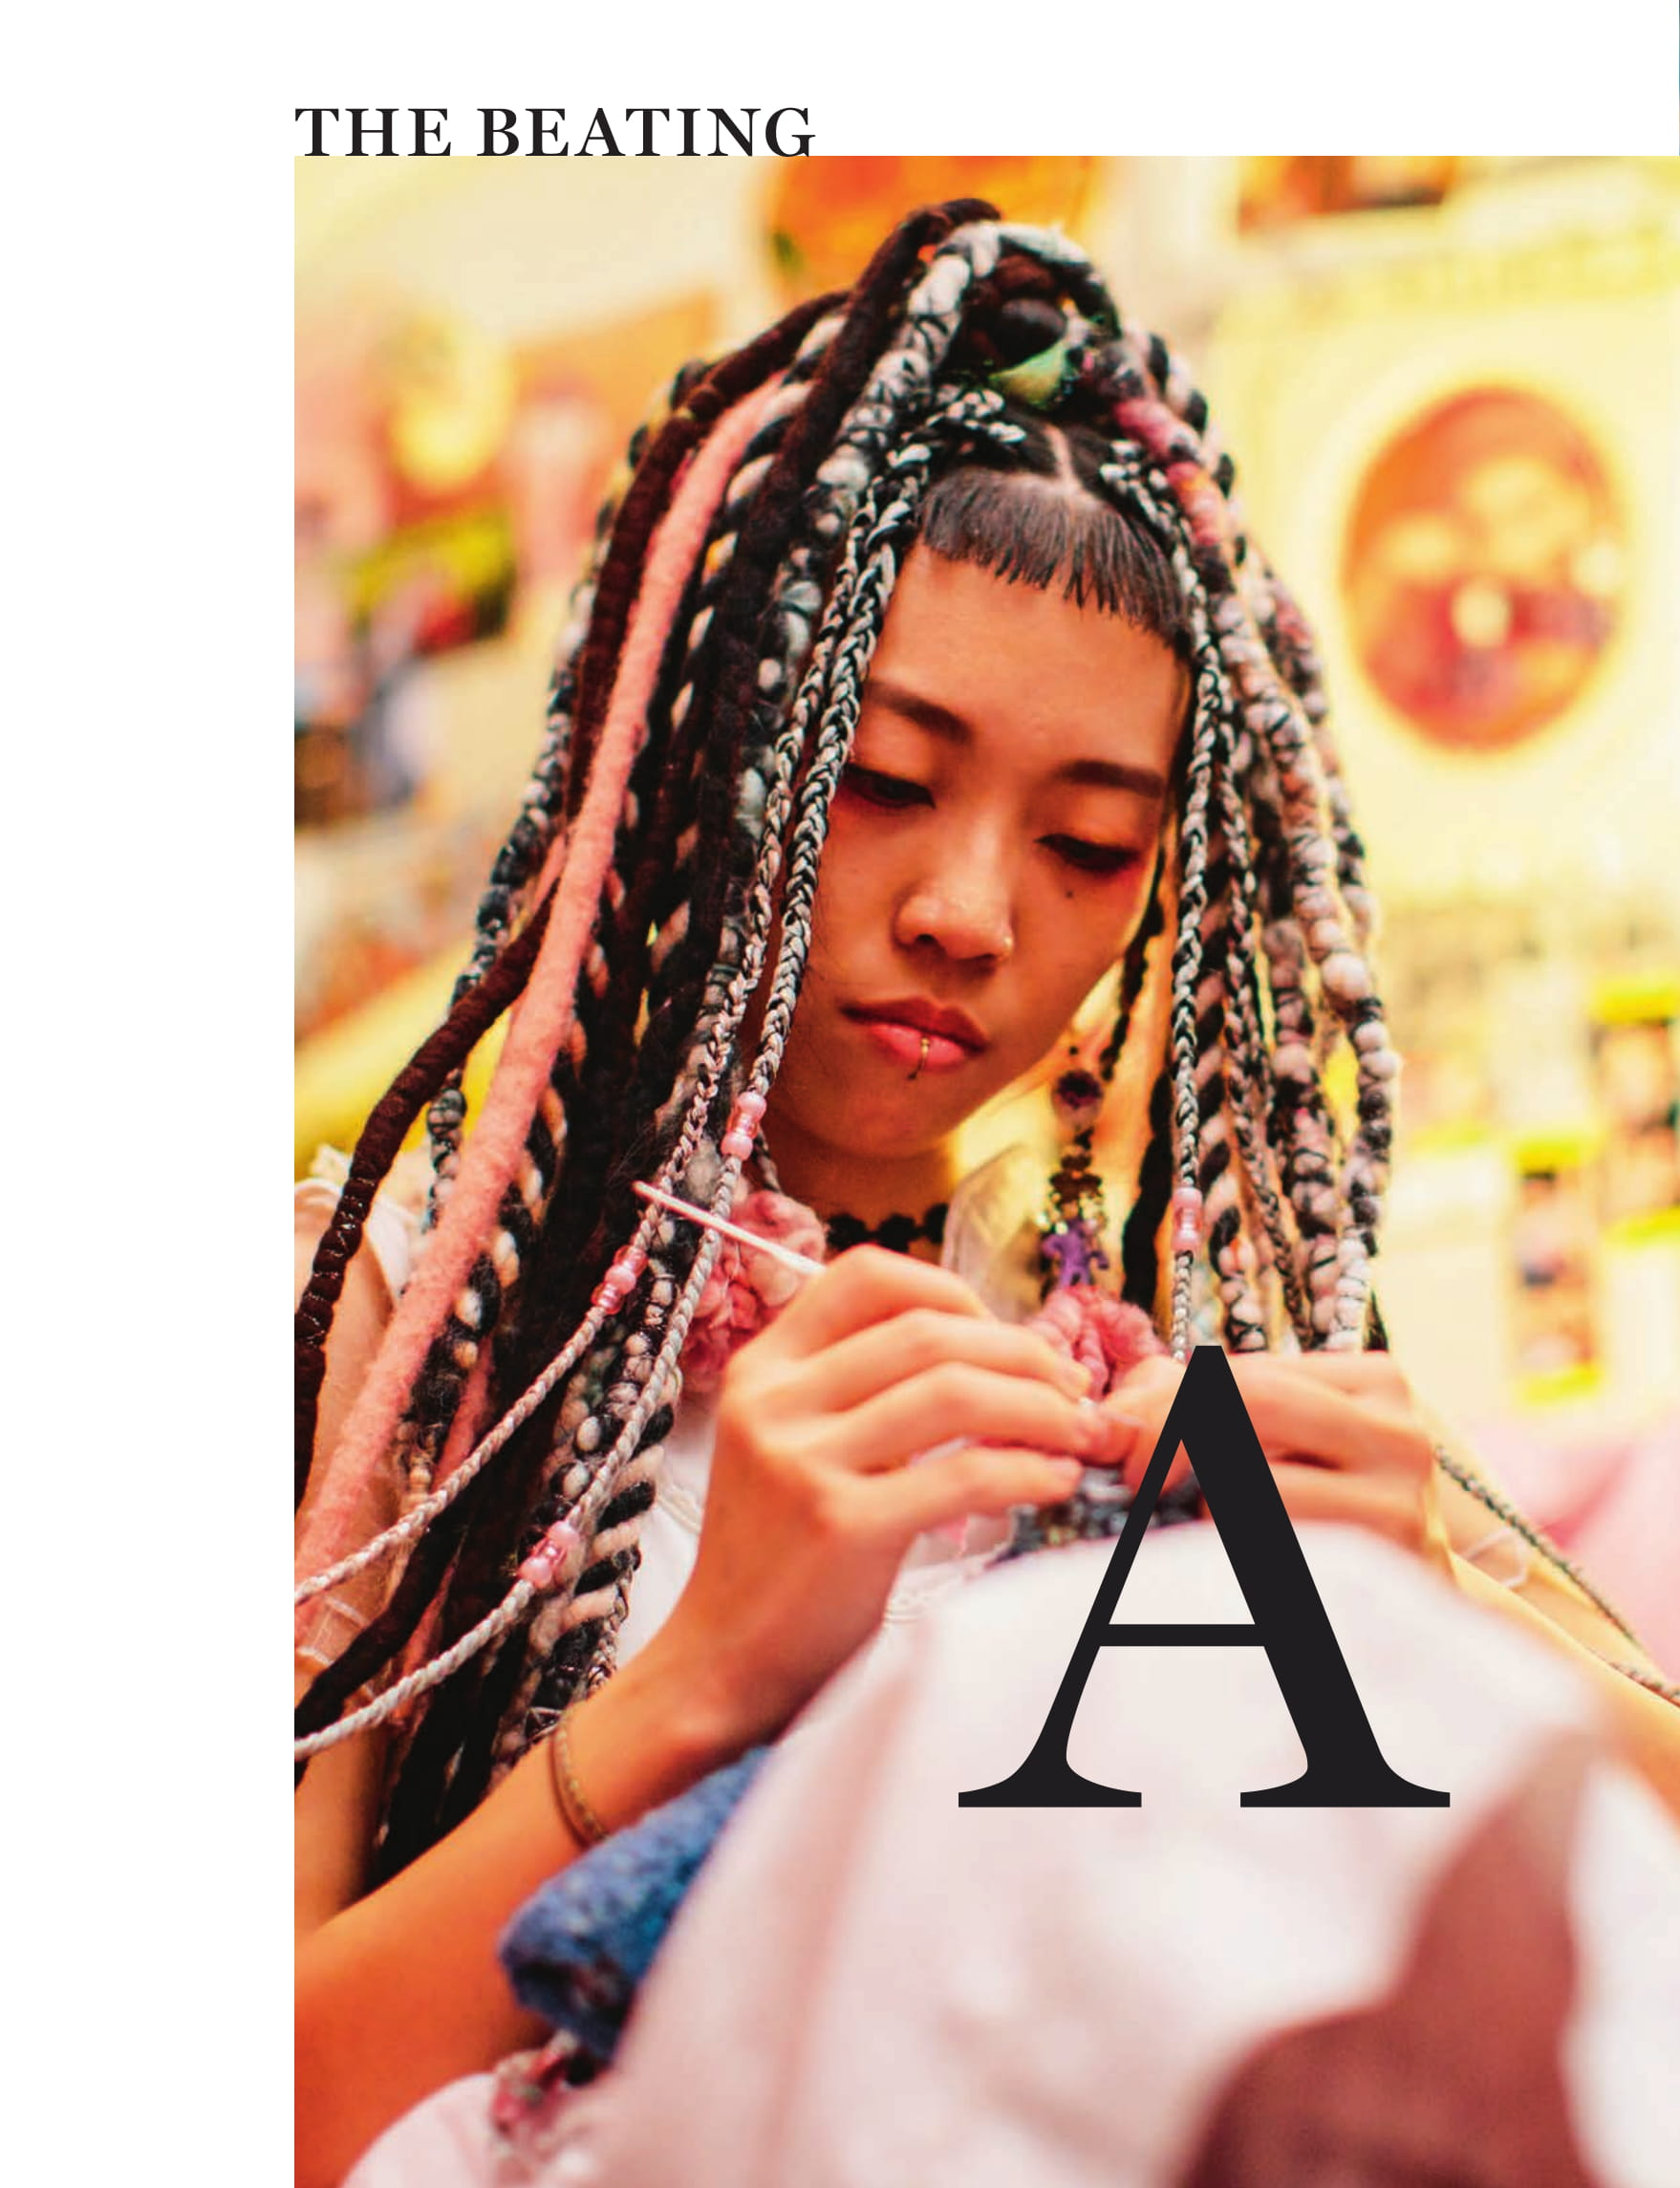 Singapore artists p86 1